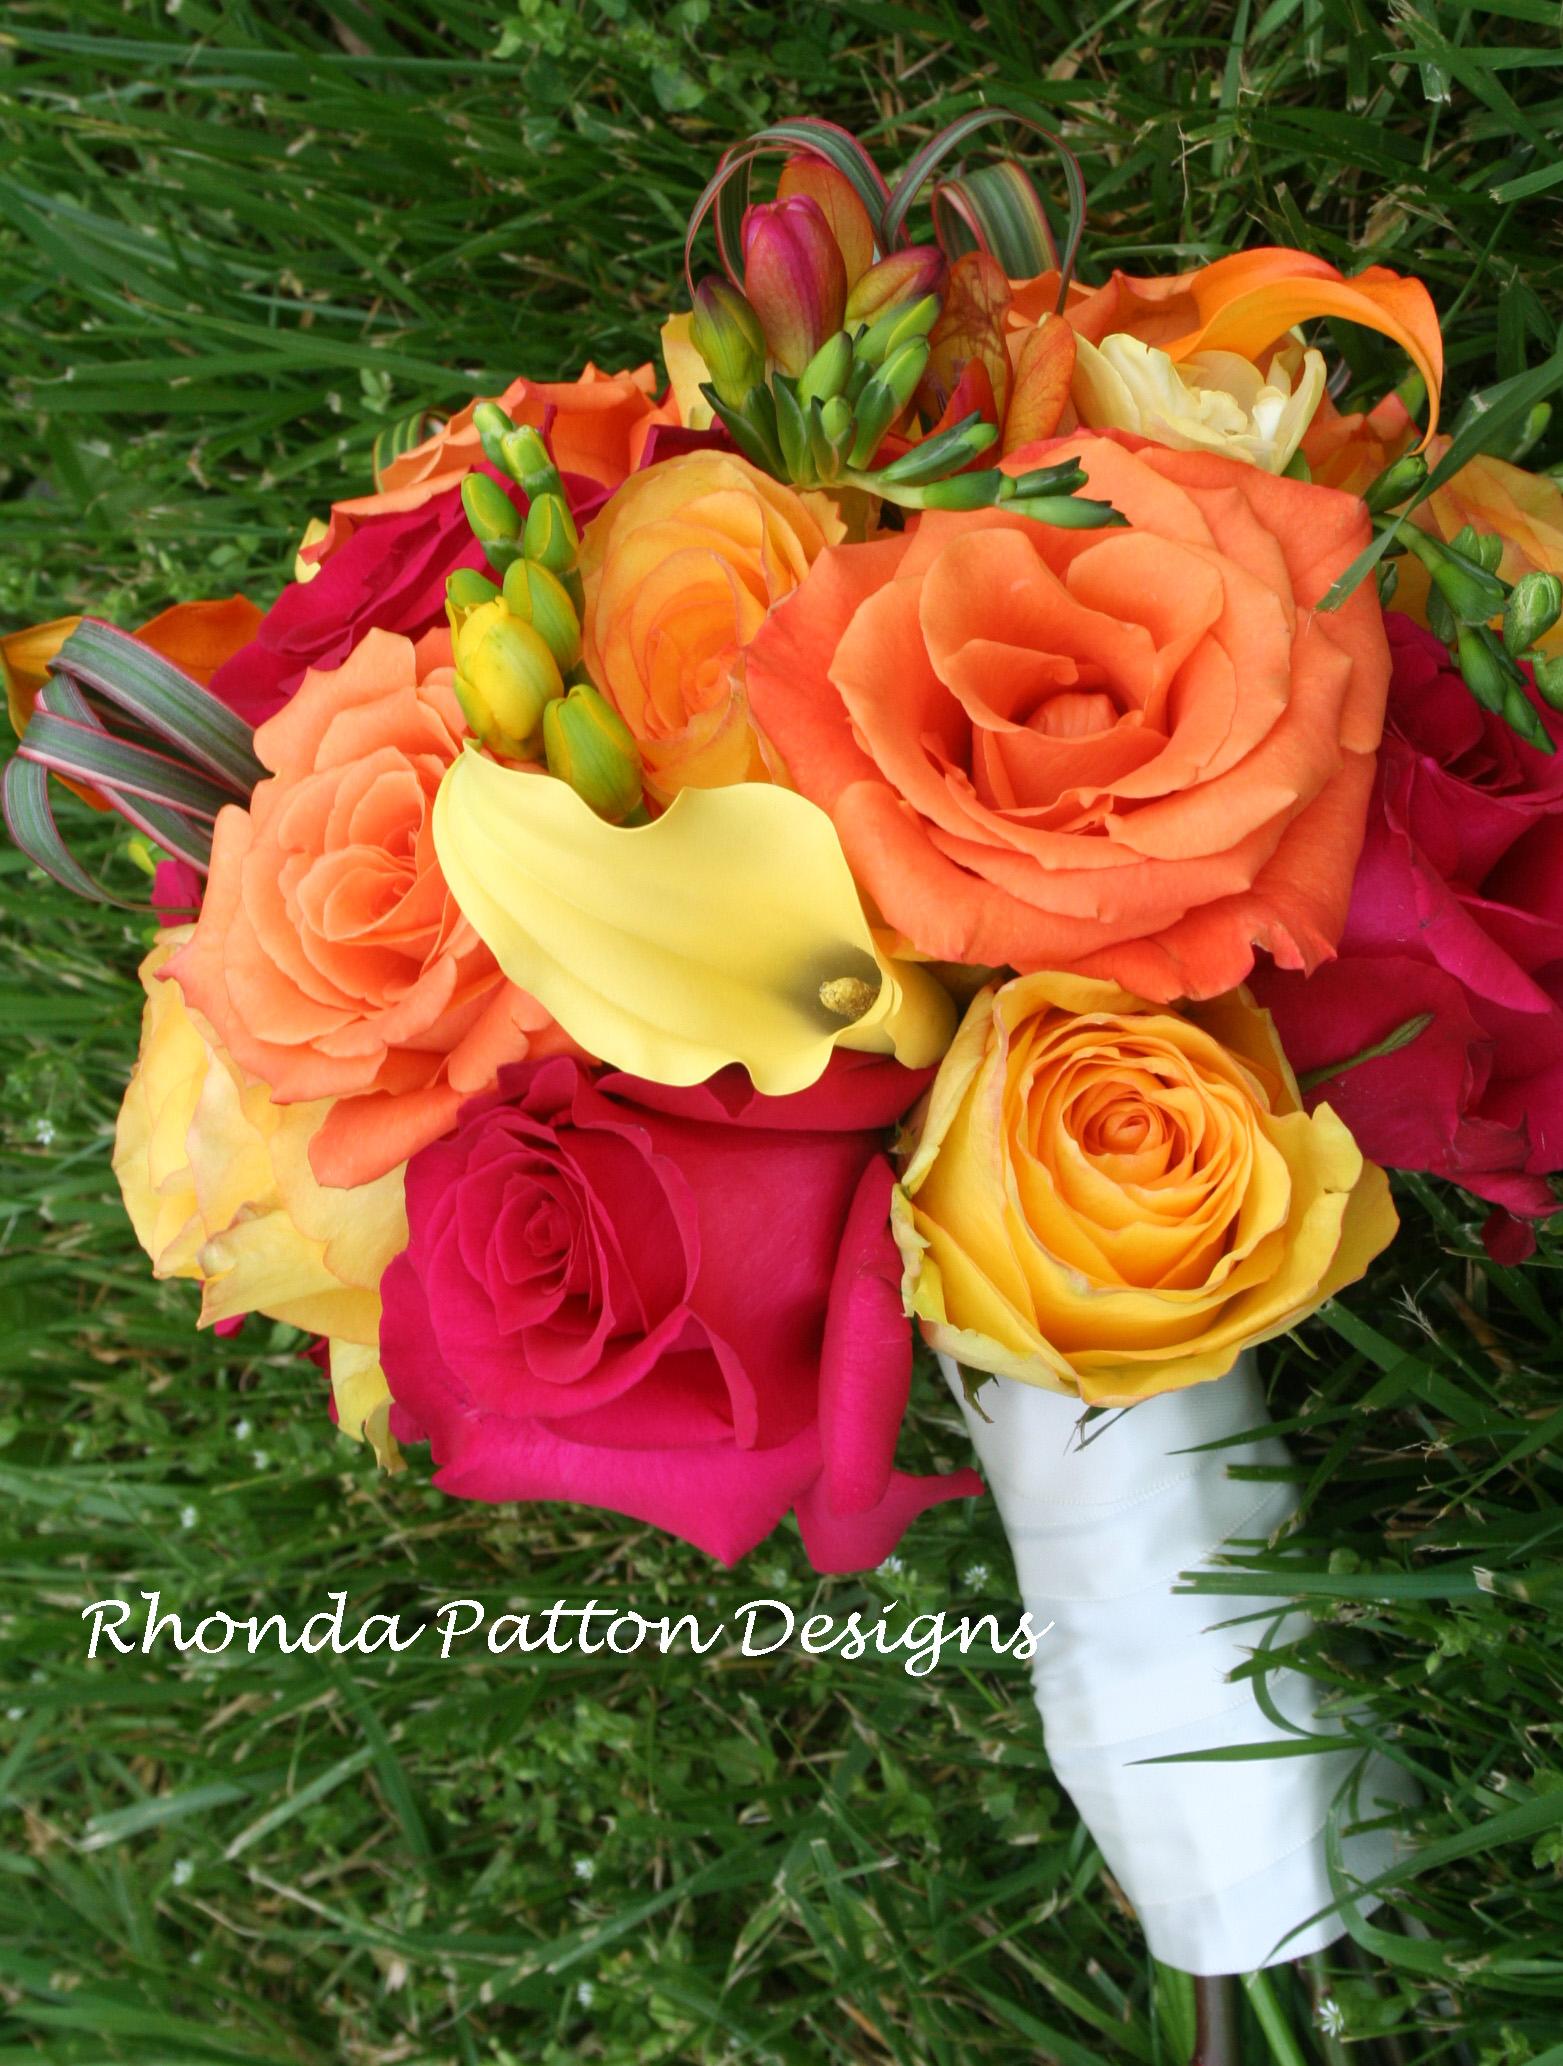 Spring Flower Power - Rhonda Patton Weddings & Events